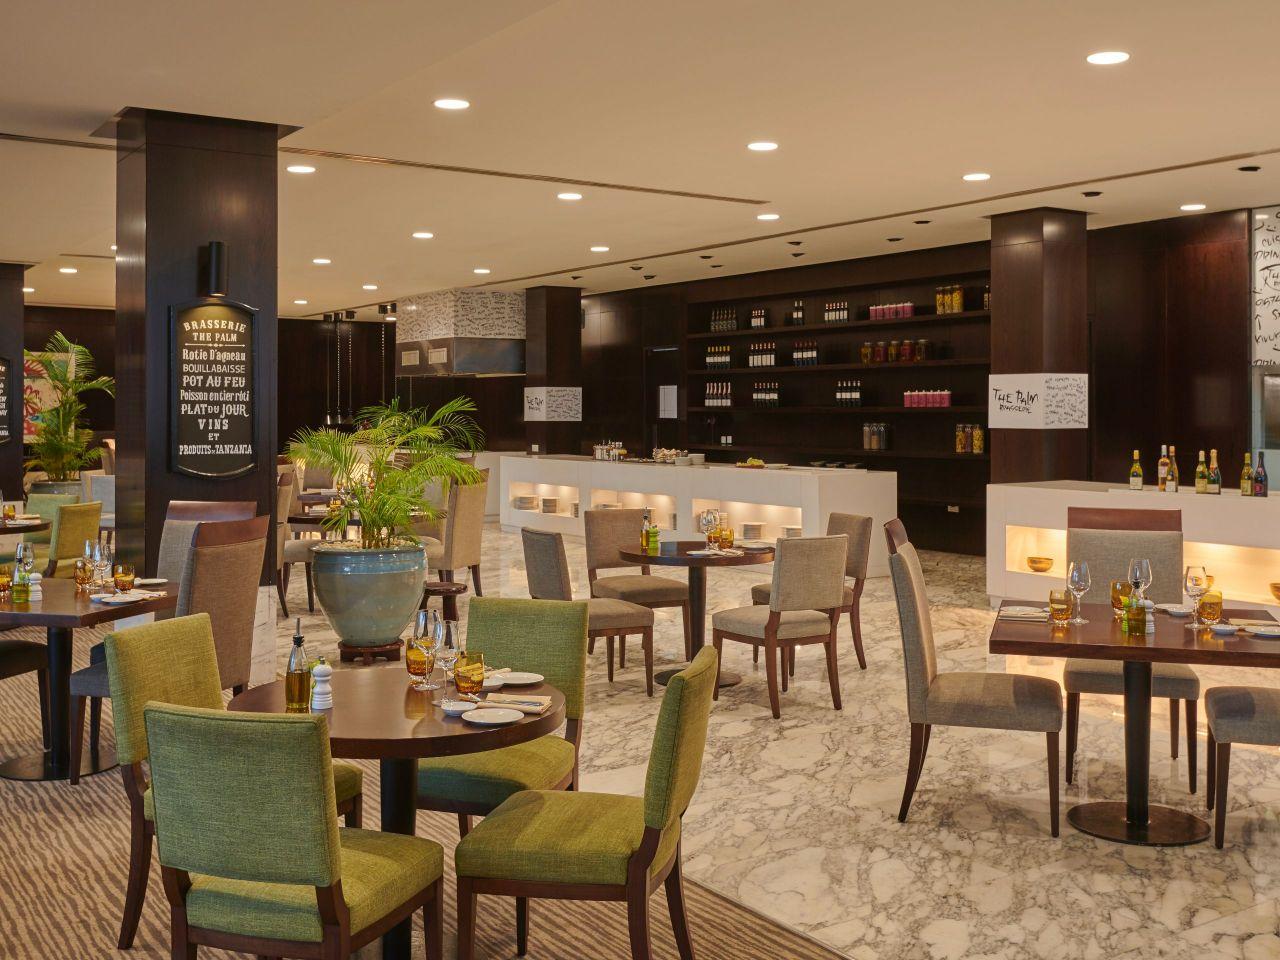 The Palm Brasserie